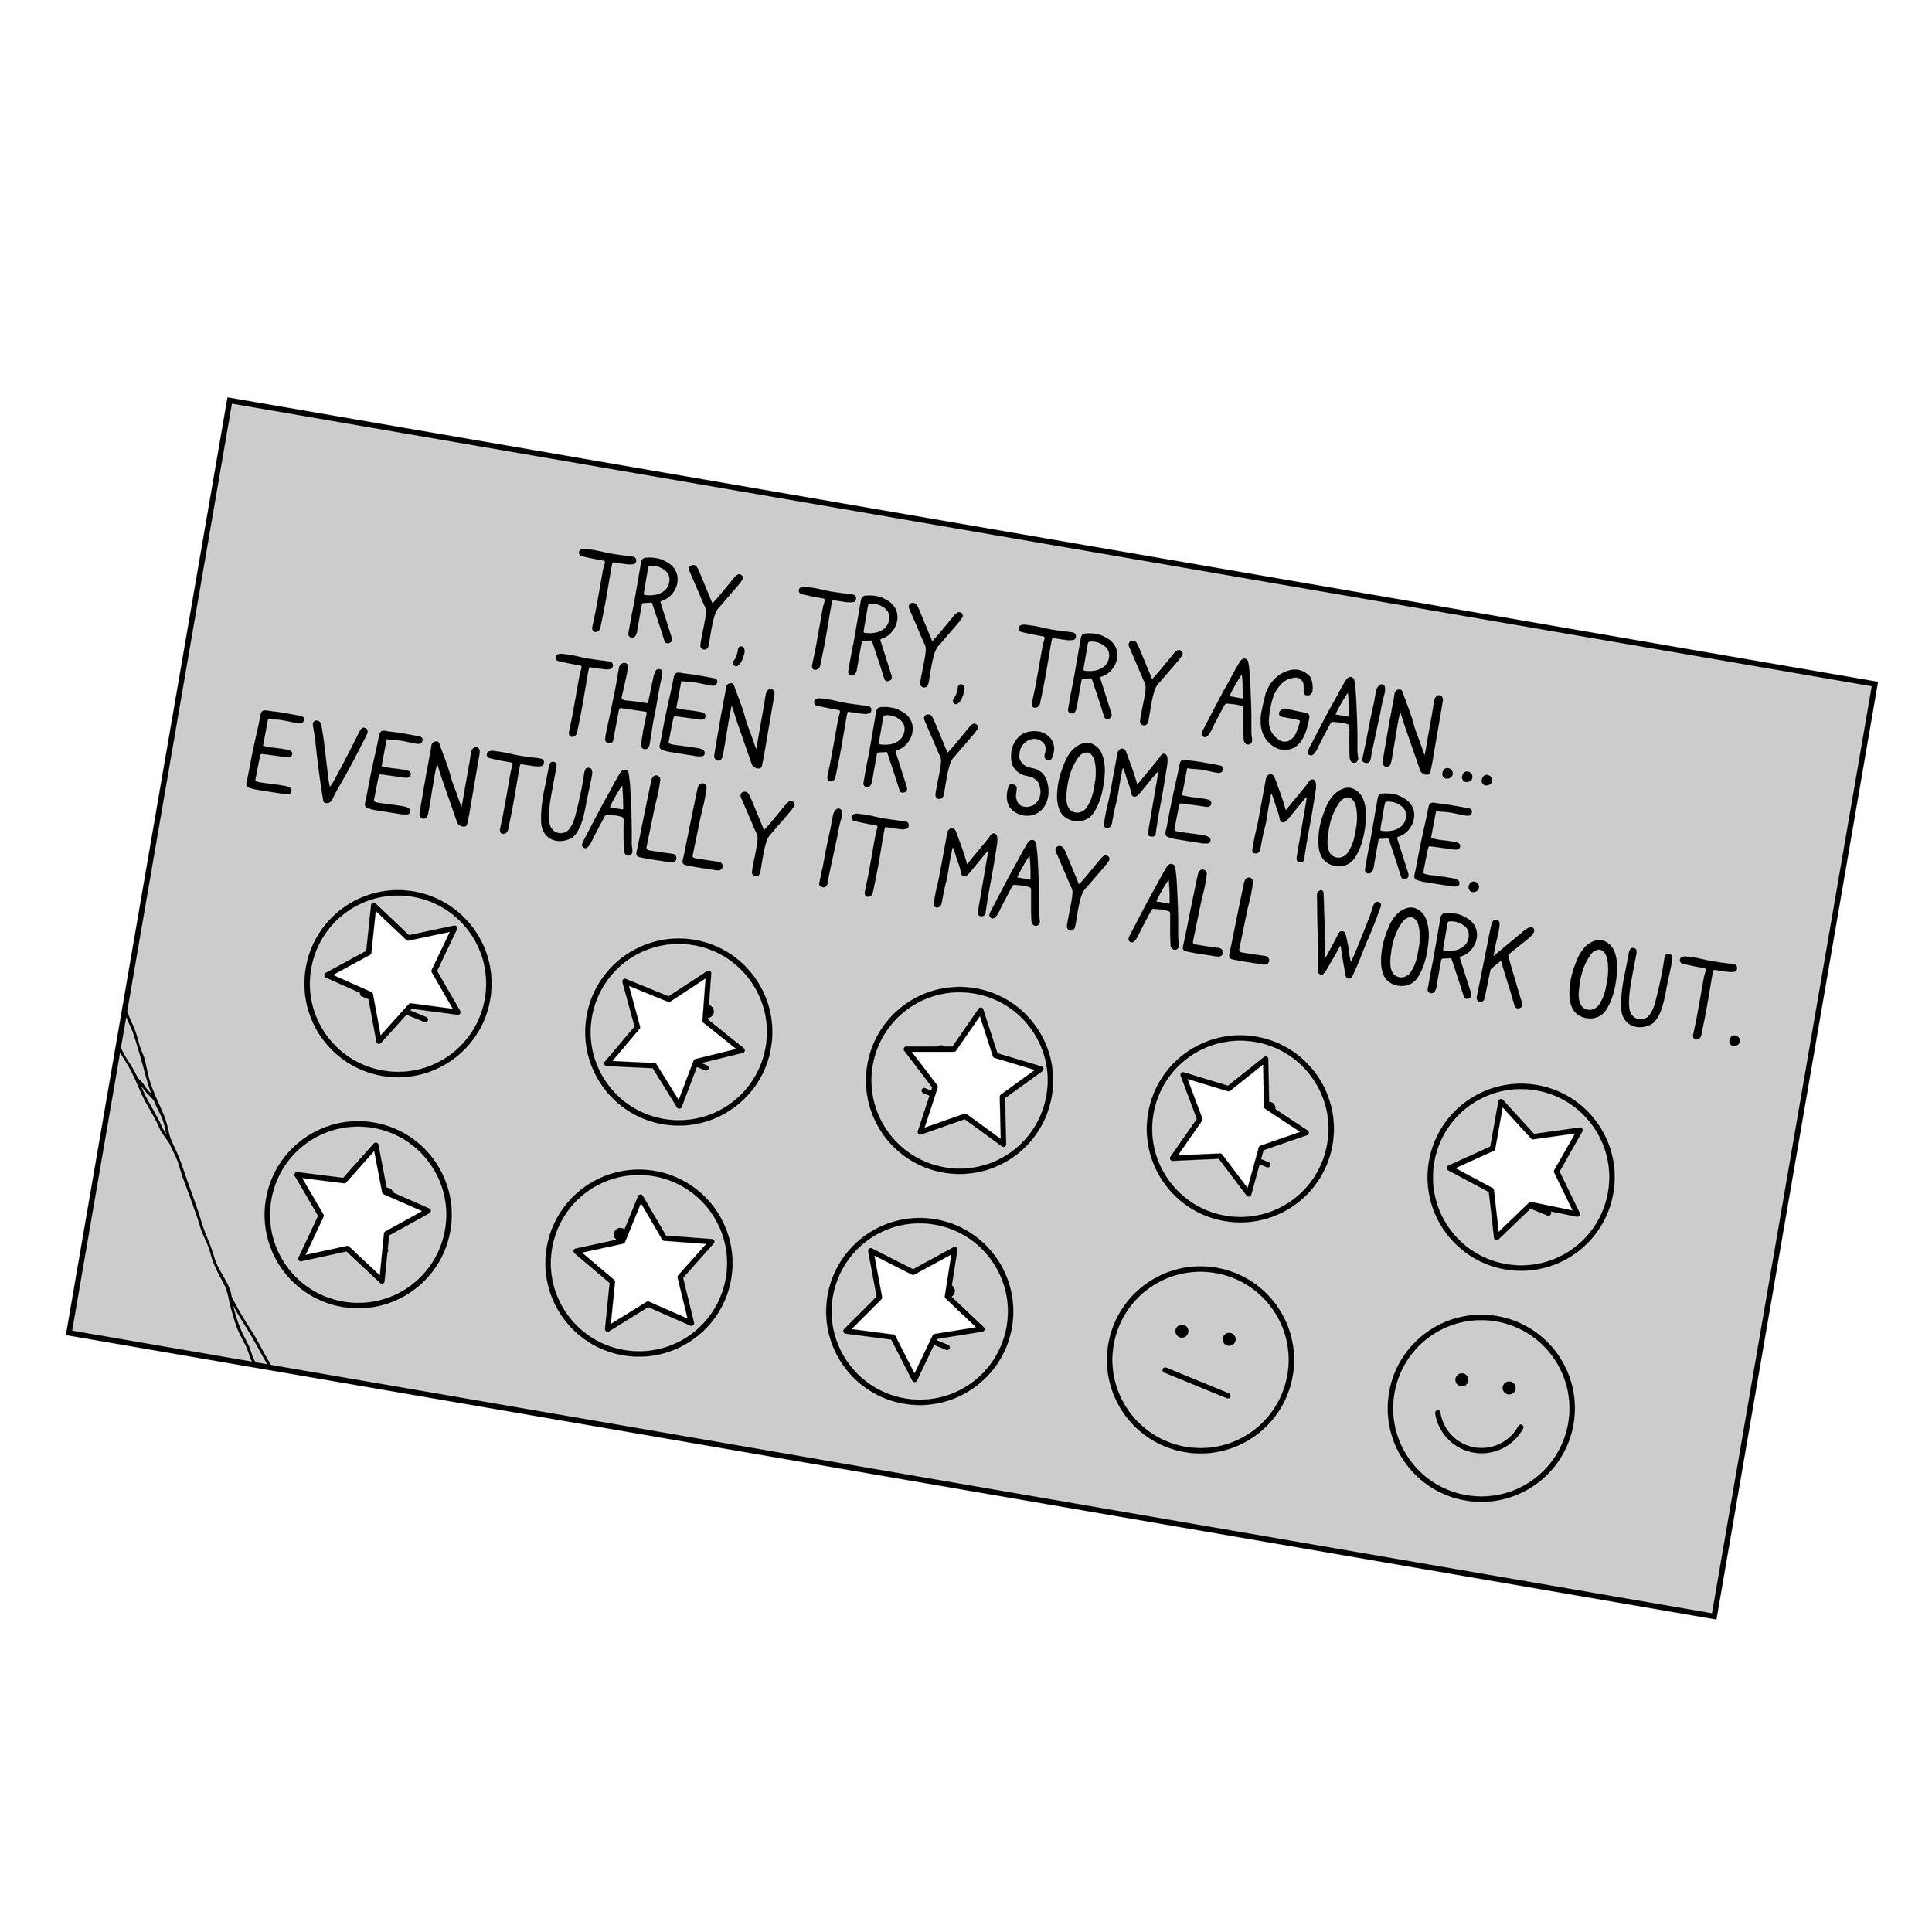 tryagaincard-01.jpg